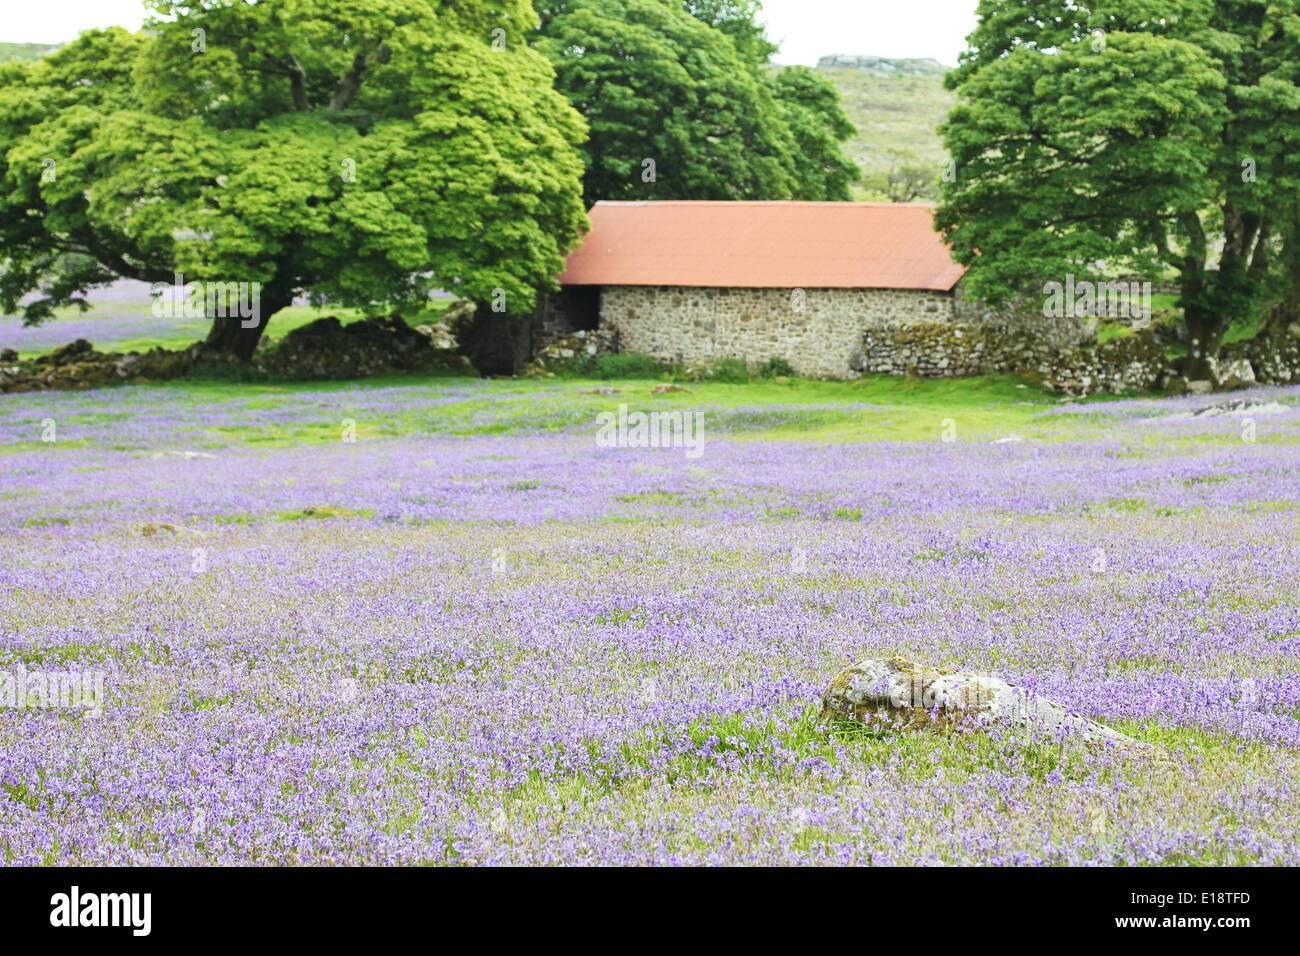 Emsworthy Mire, Dartmoor, Devon, UK. 27th May 2014. Fields of bluebells in full bloom at Emsworthy Mire on Dartmoor. Credit: nidpor/Alamy Live News - Stock Image